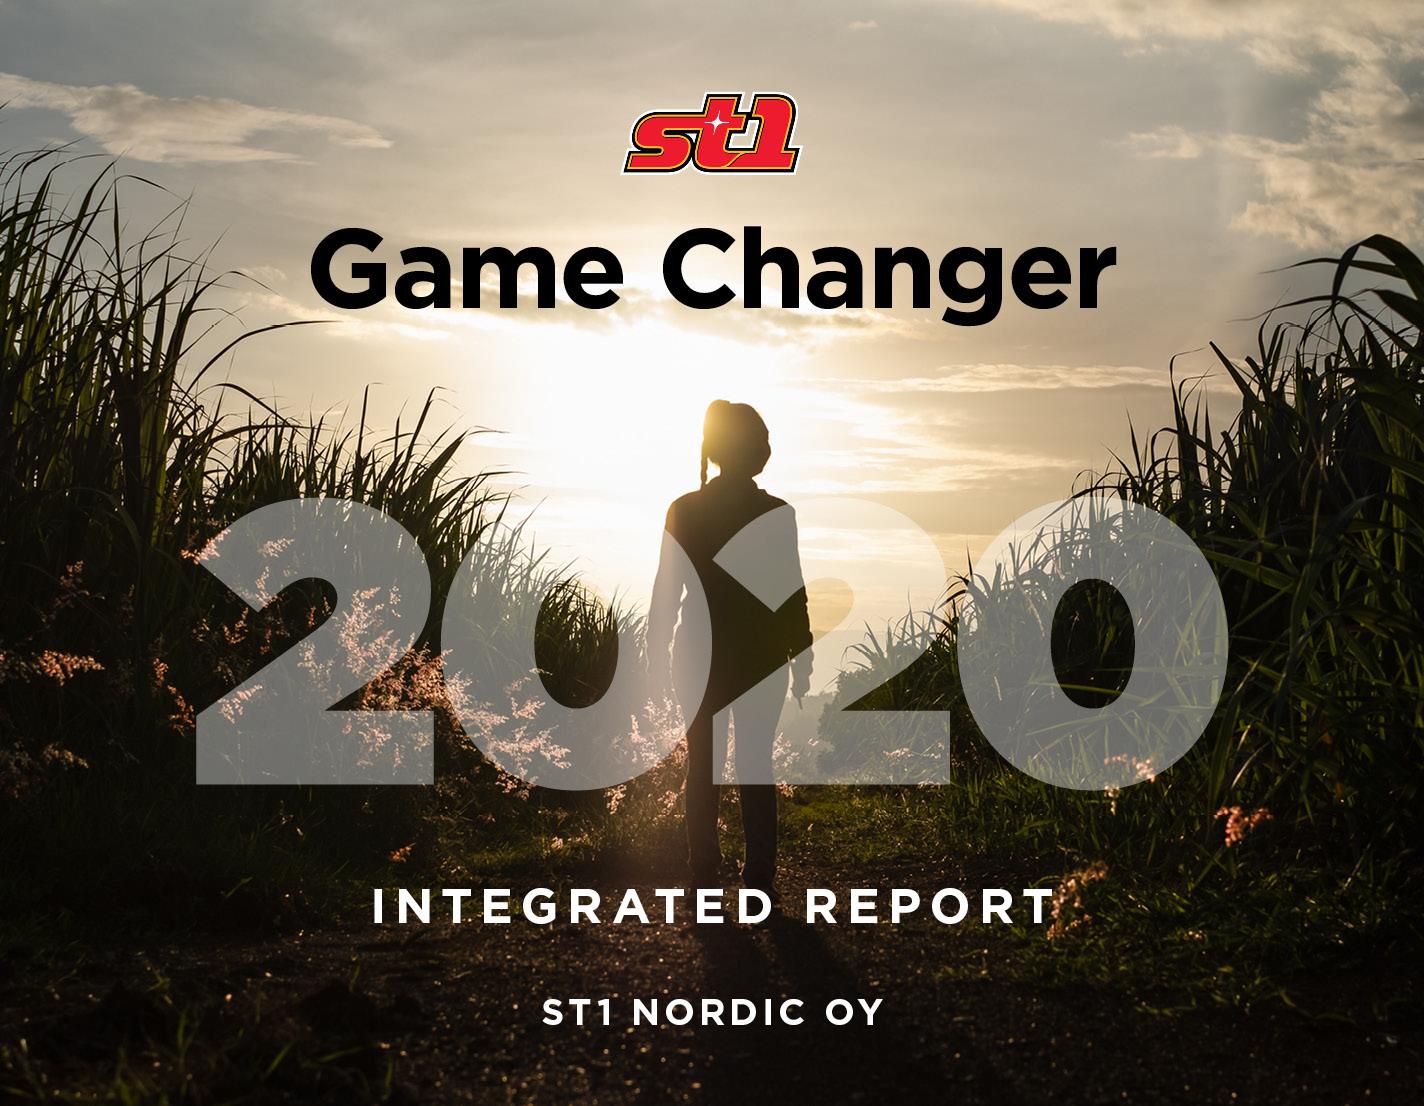 St1 Game Changer 2020